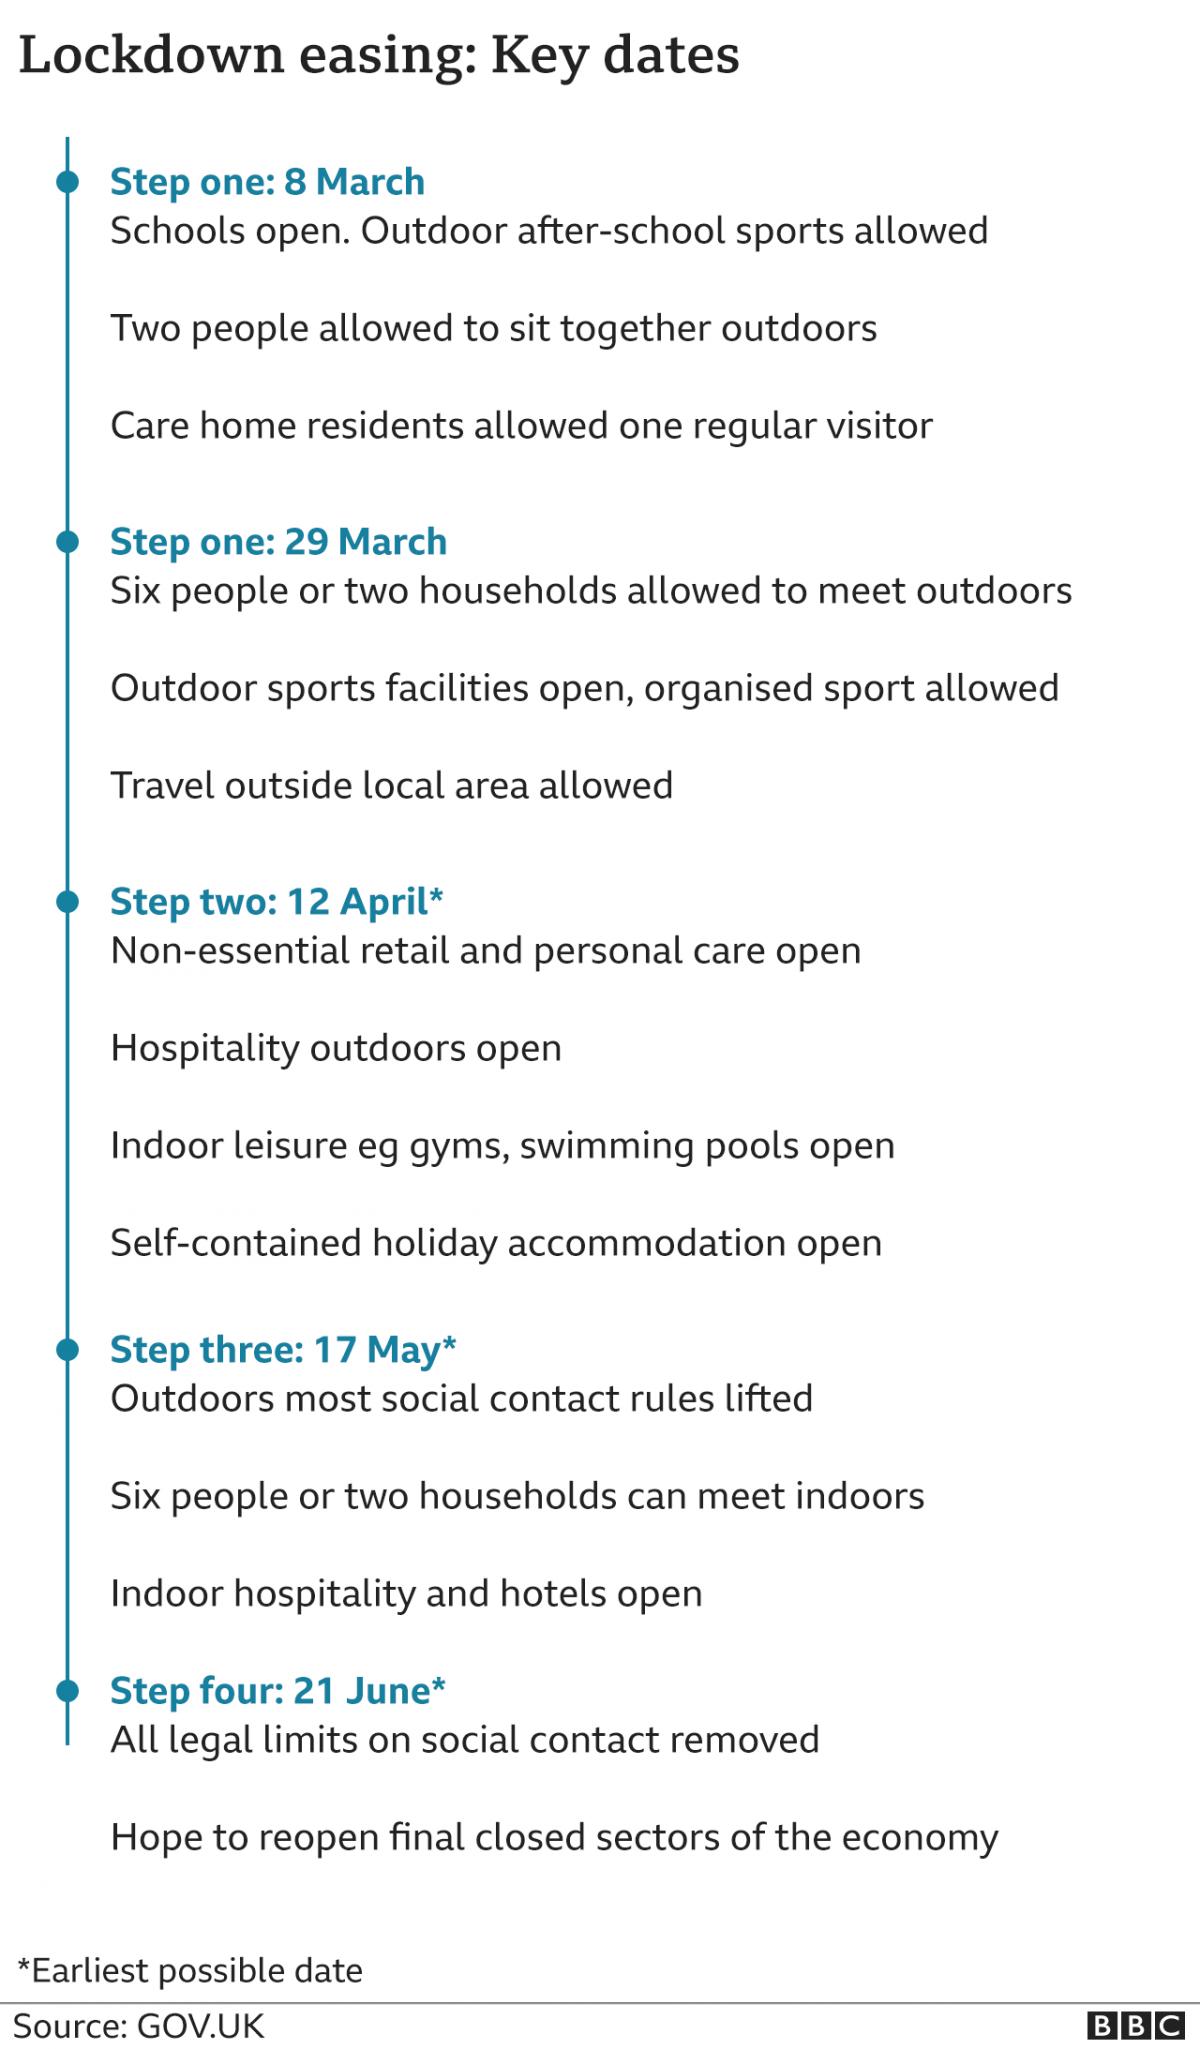 Key dates in easing the lockdown in England